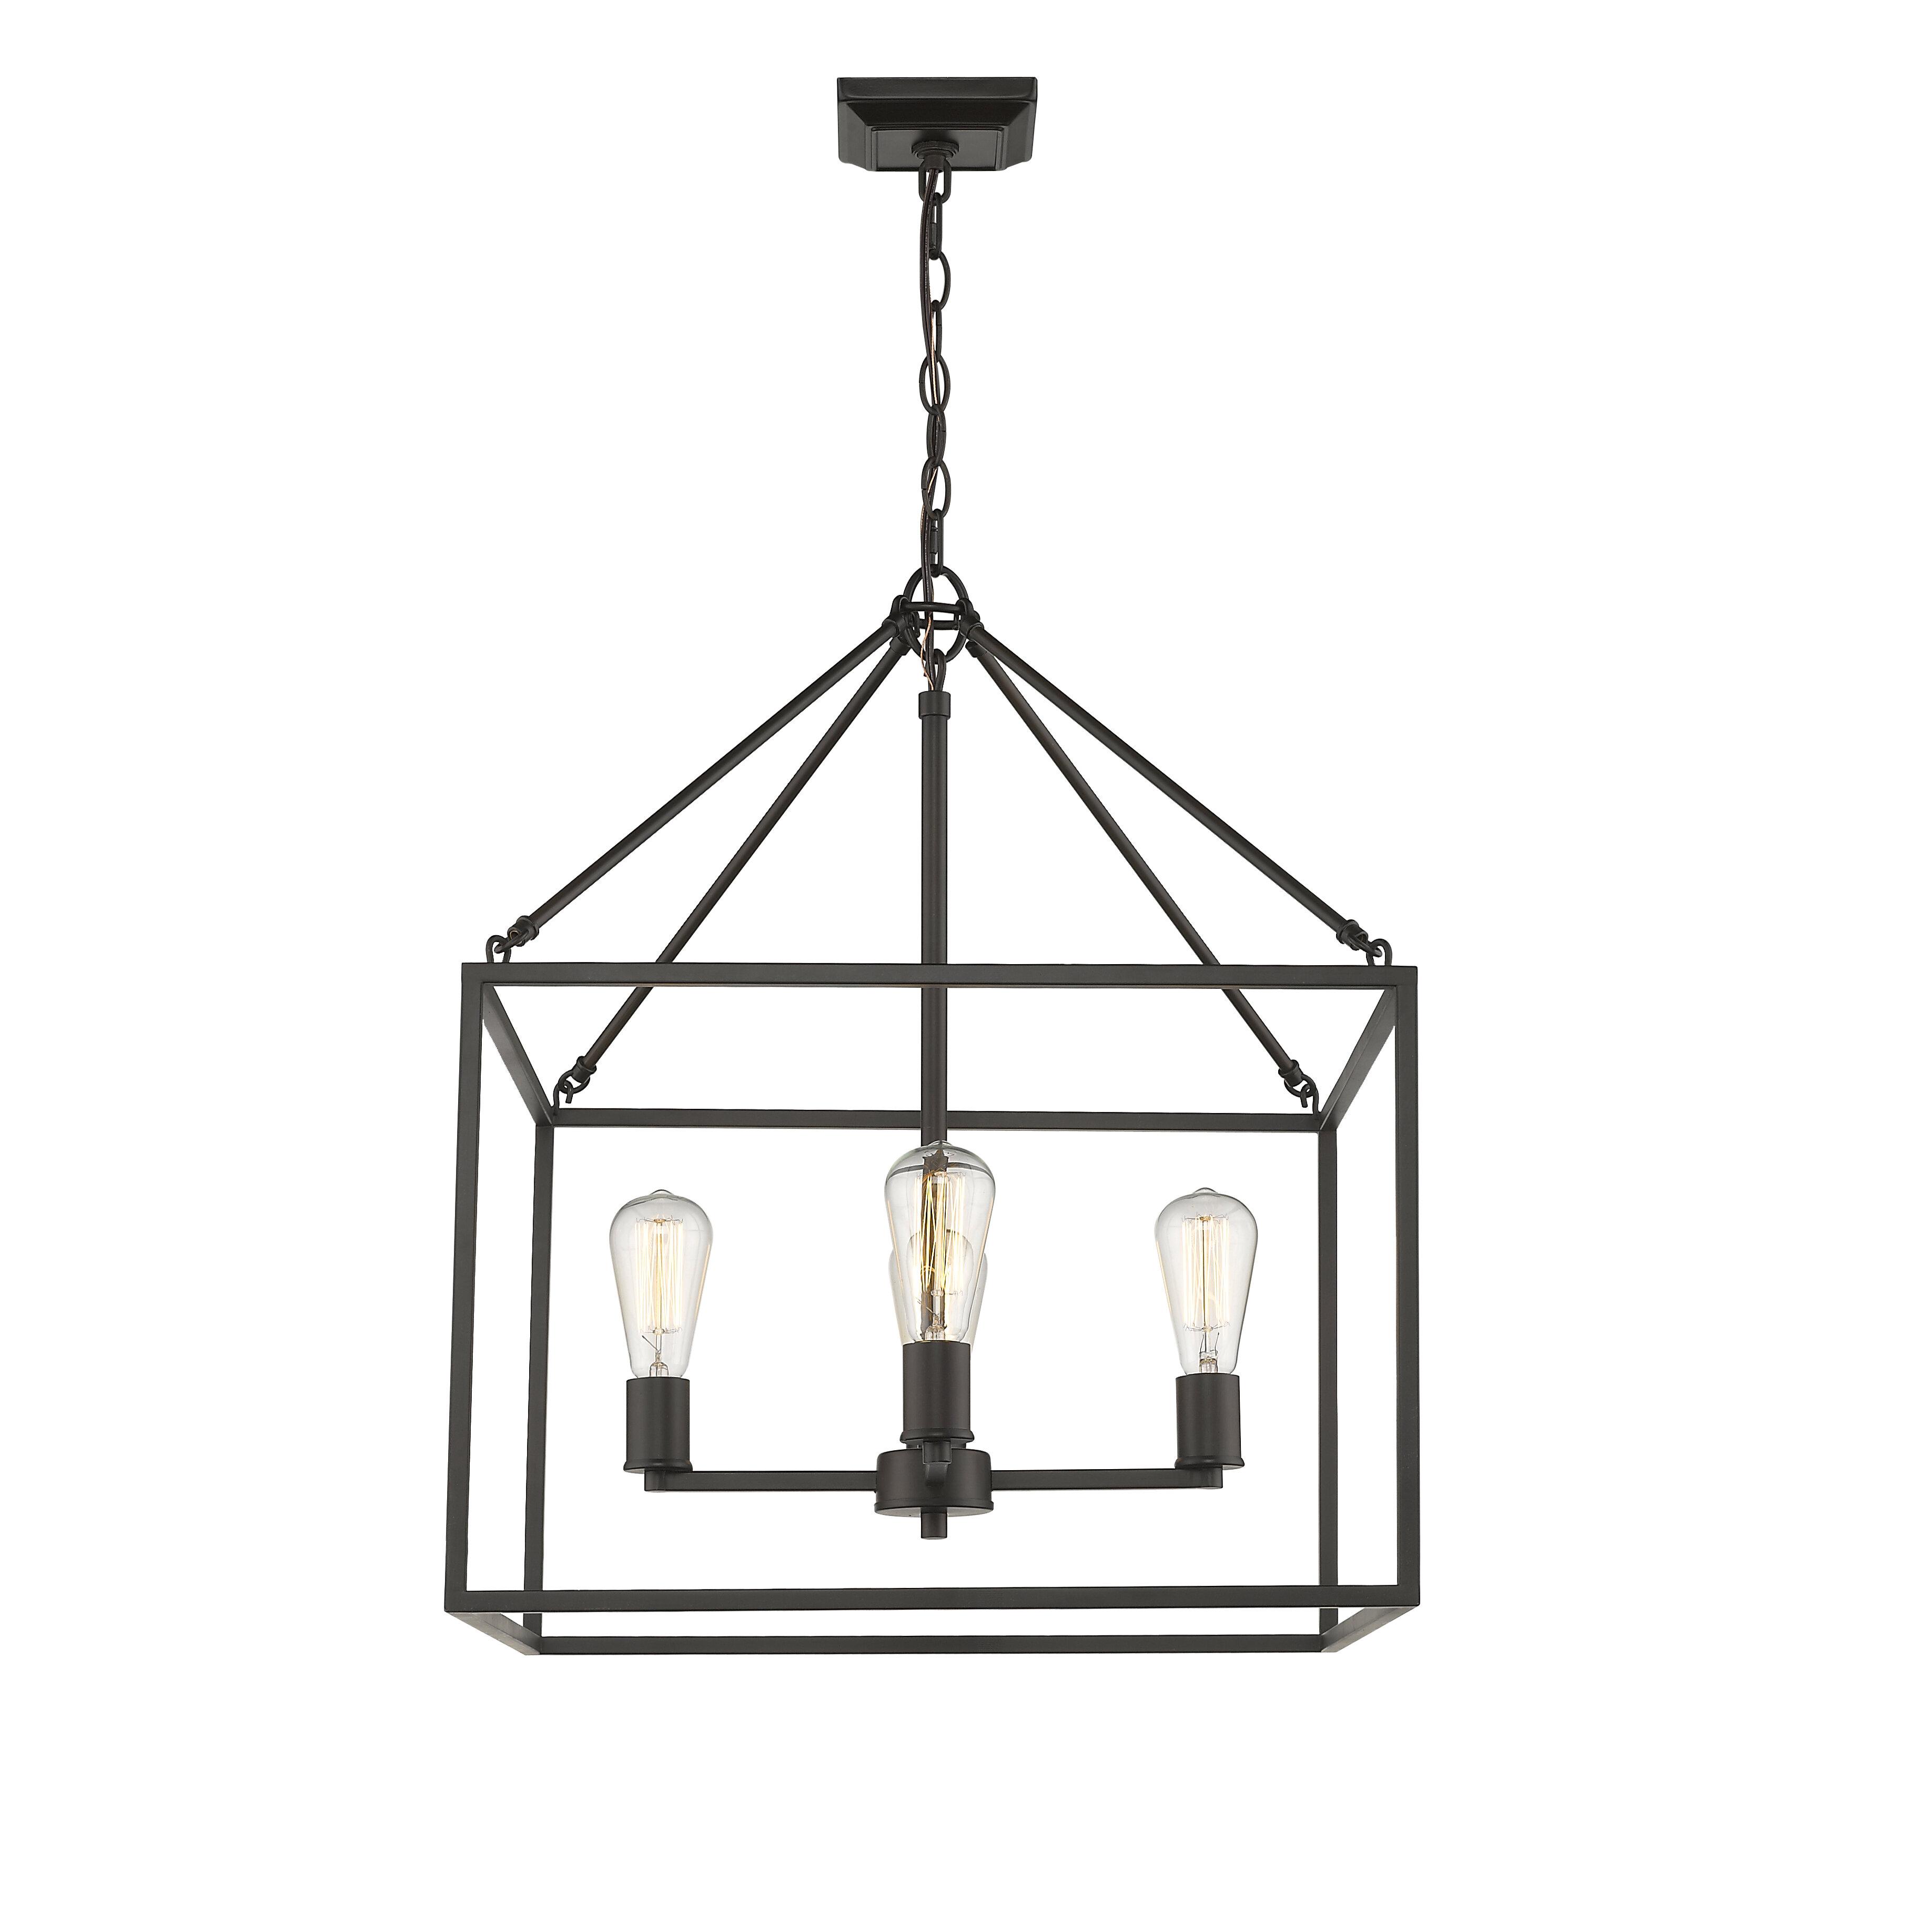 Zabel 4-Light Lantern Square / Rectangle Pendant pertaining to Carmen 8-Light Lantern Tiered Pendants (Image 30 of 30)